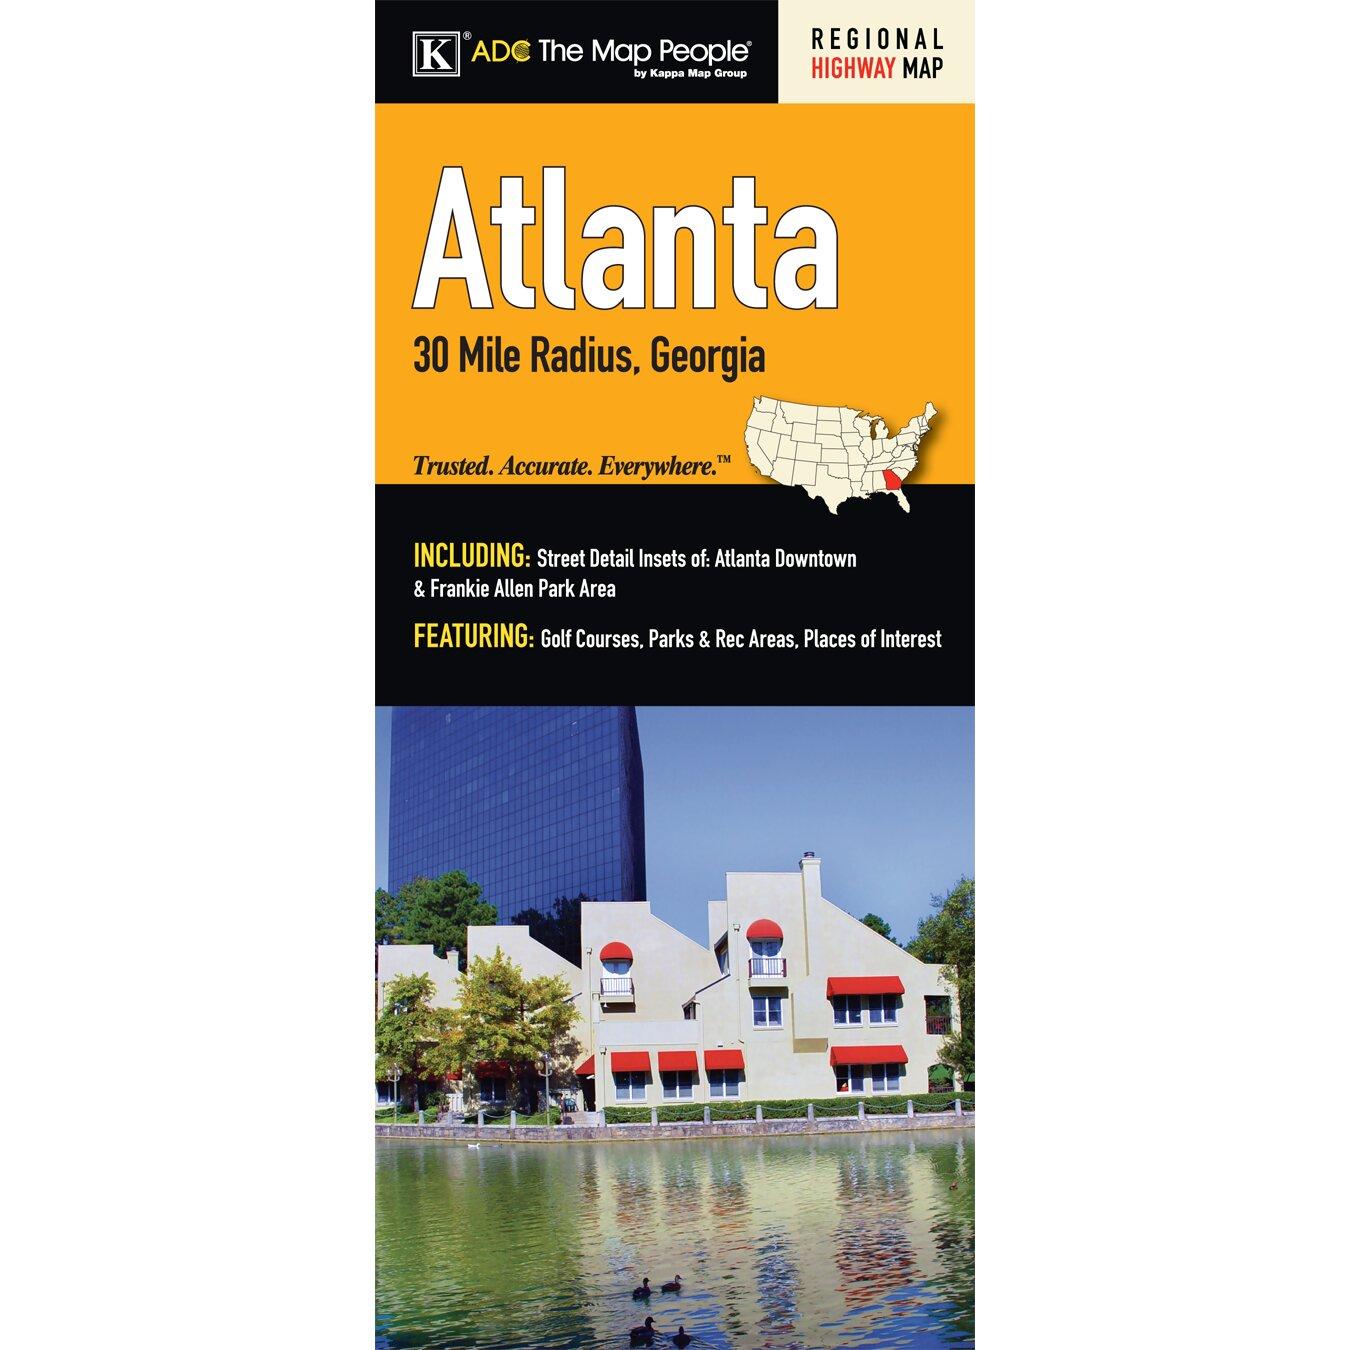 Atlanta Ga Zip Code Map Free Free Image - Free map of united states zip codes